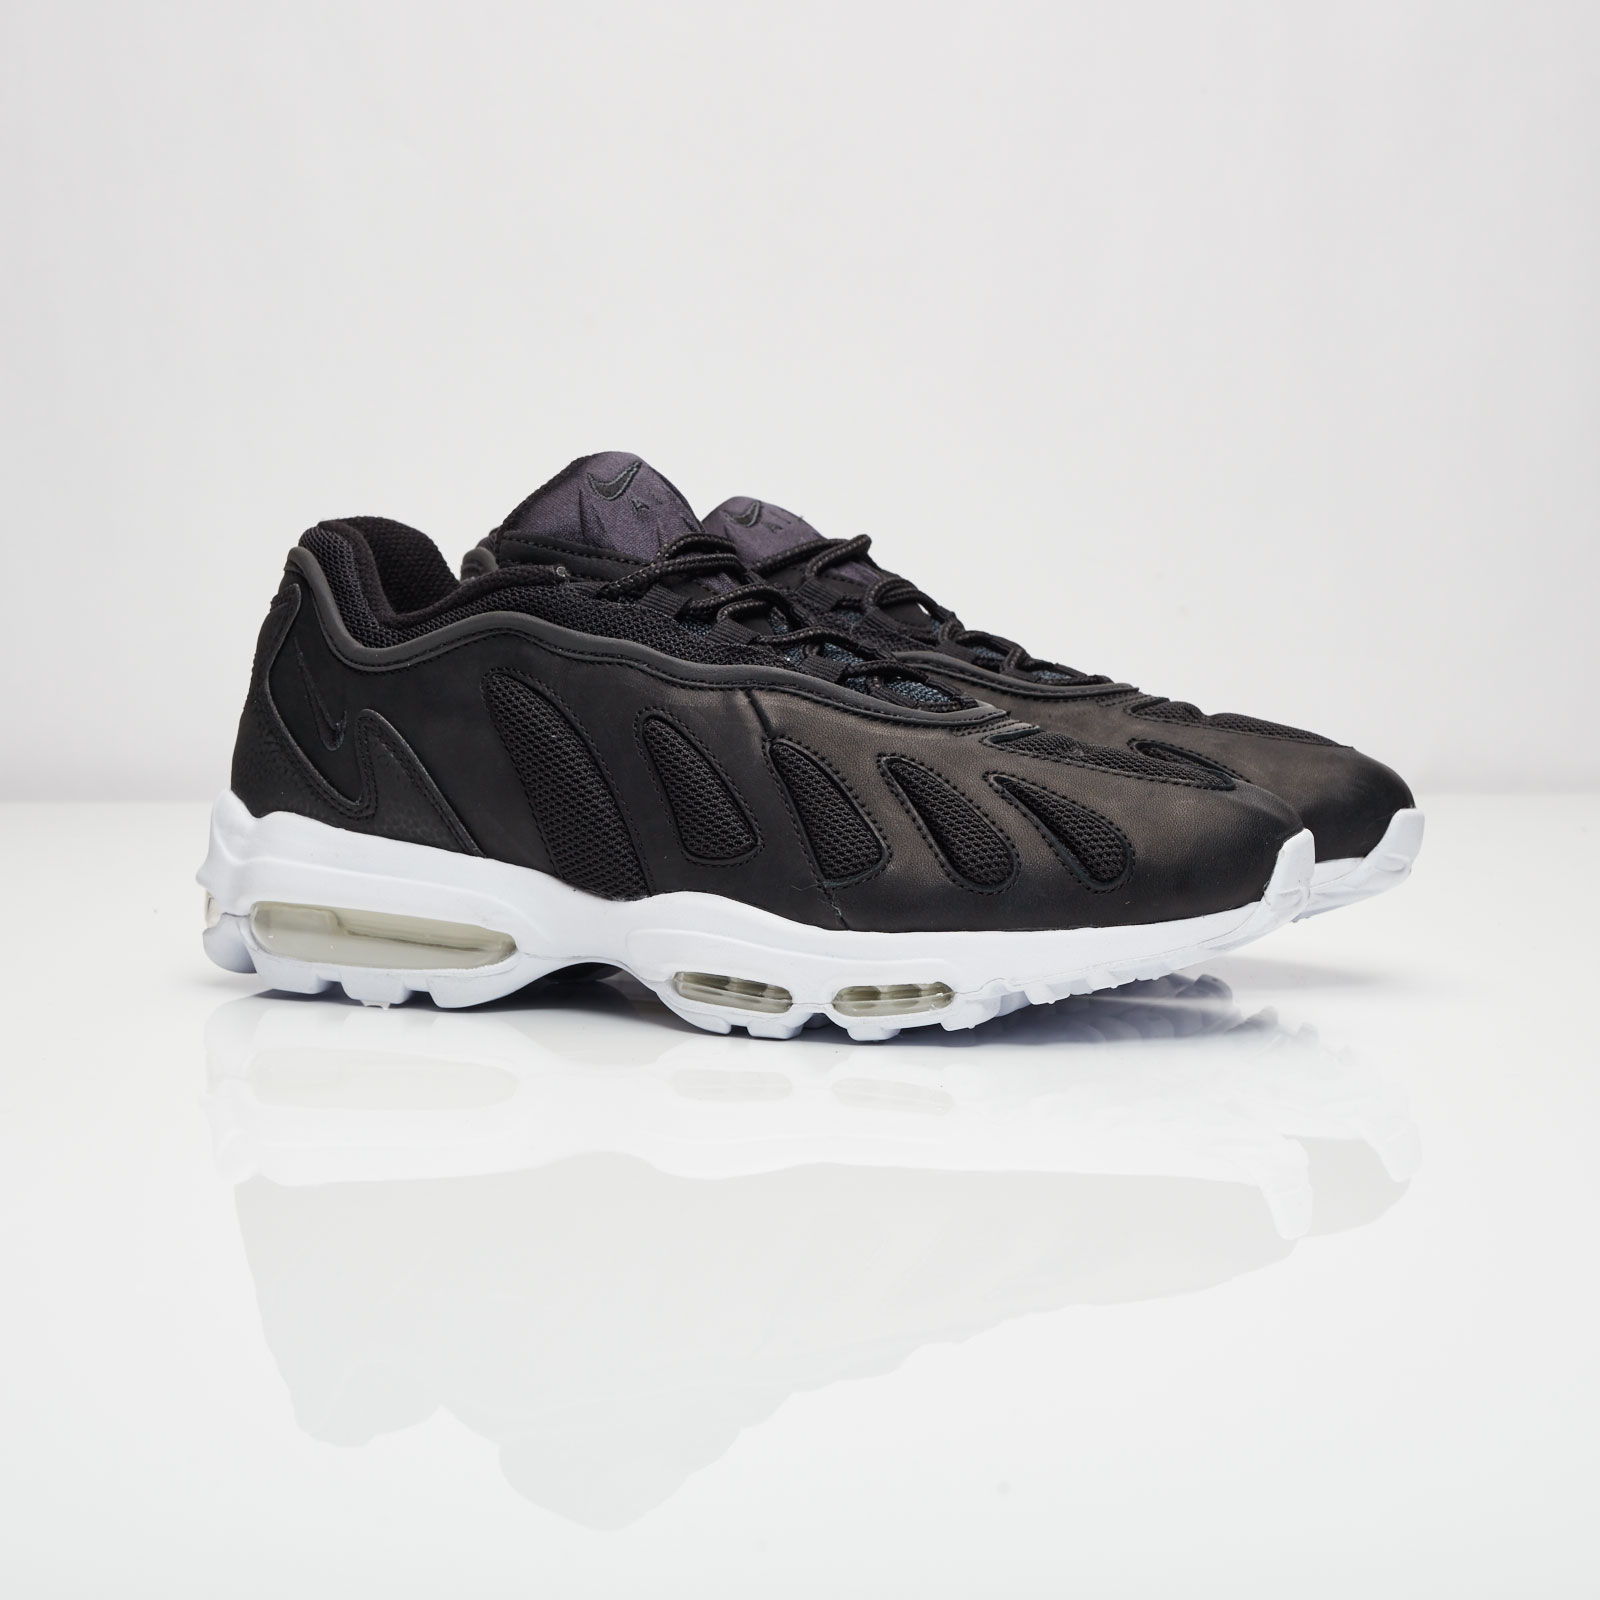 dcea74722ce1 Nike Air Max 96 XX - 870165-002 - Sneakersnstuff